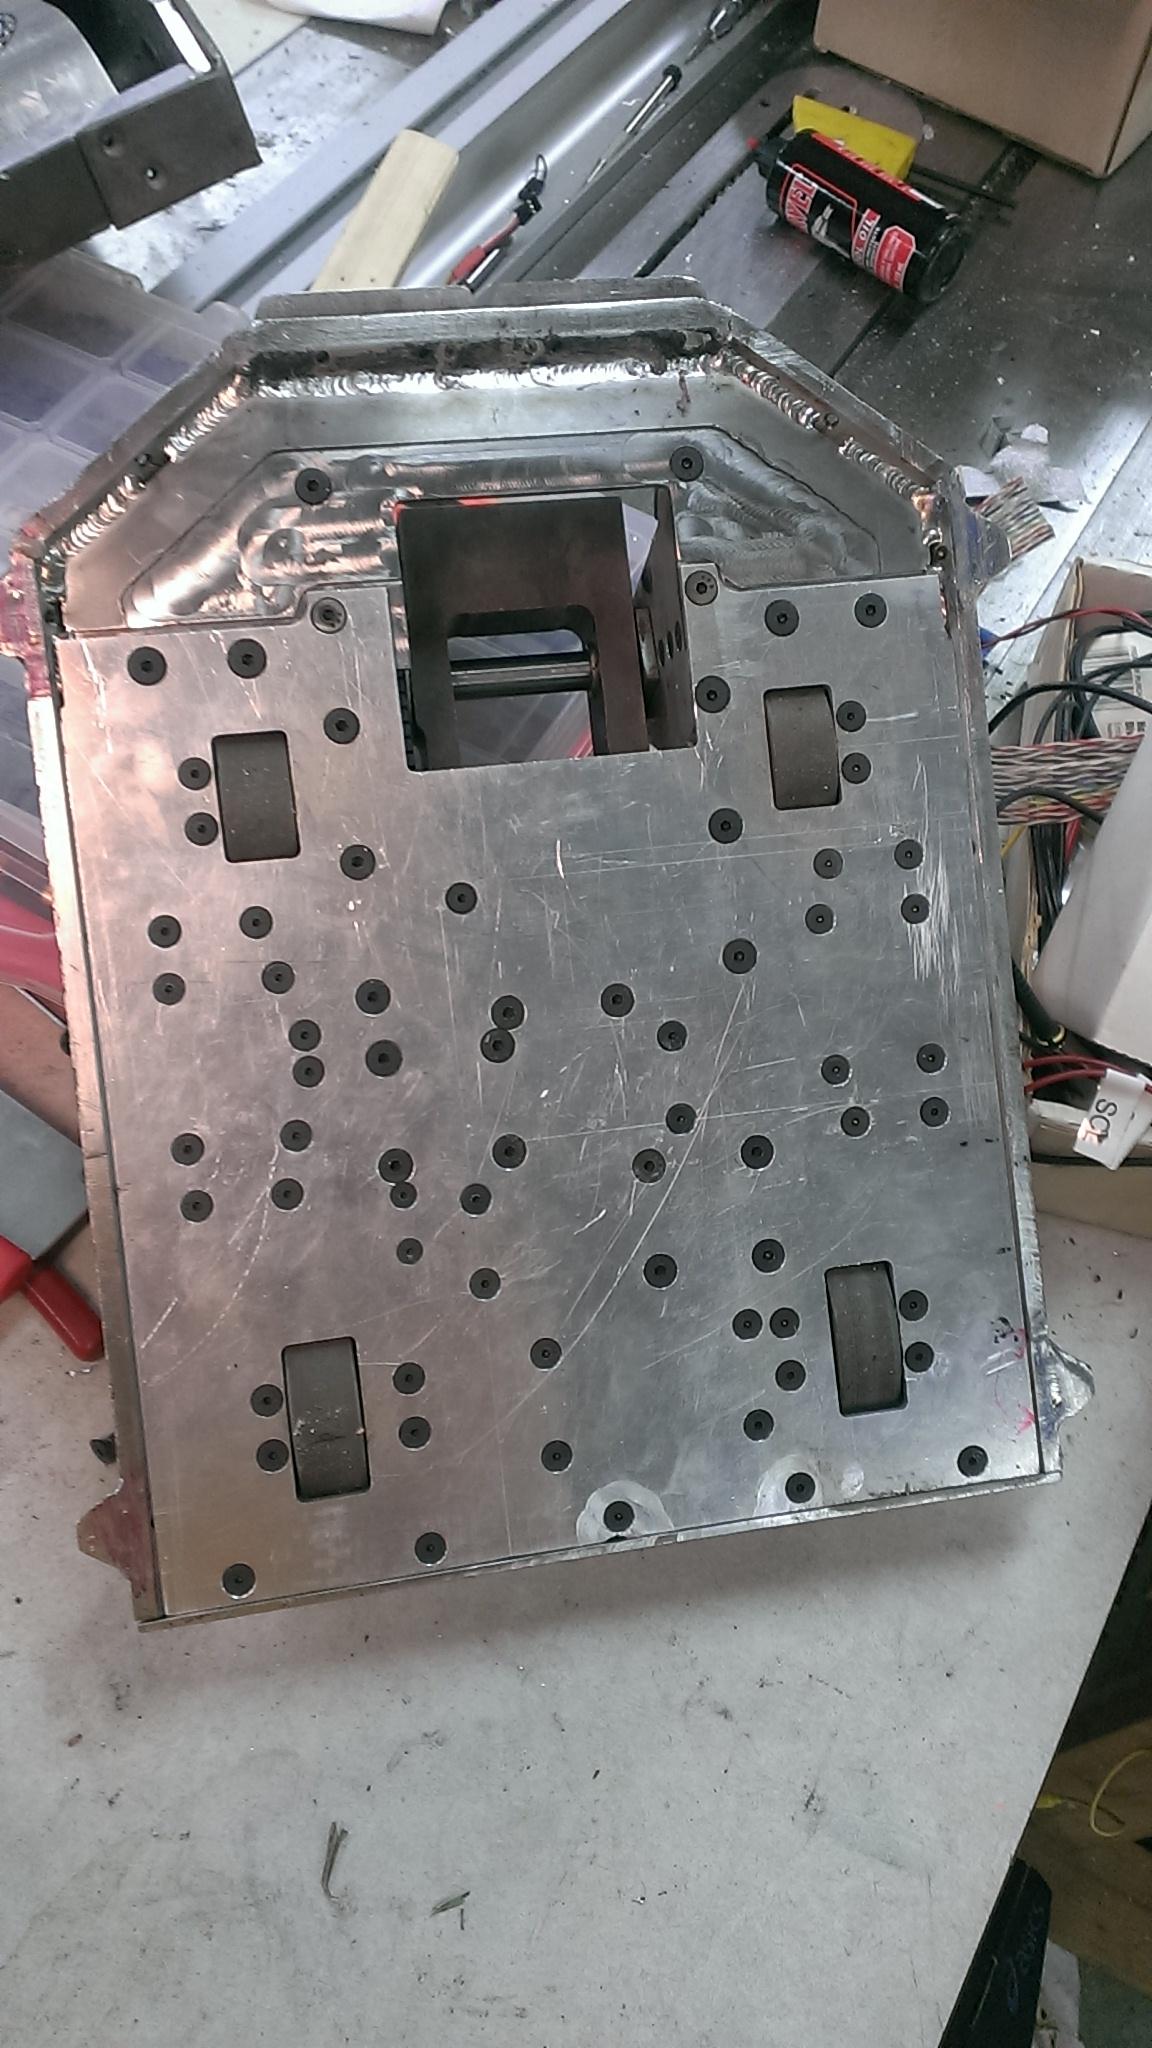 New 15 pound beater bot IMAG3330